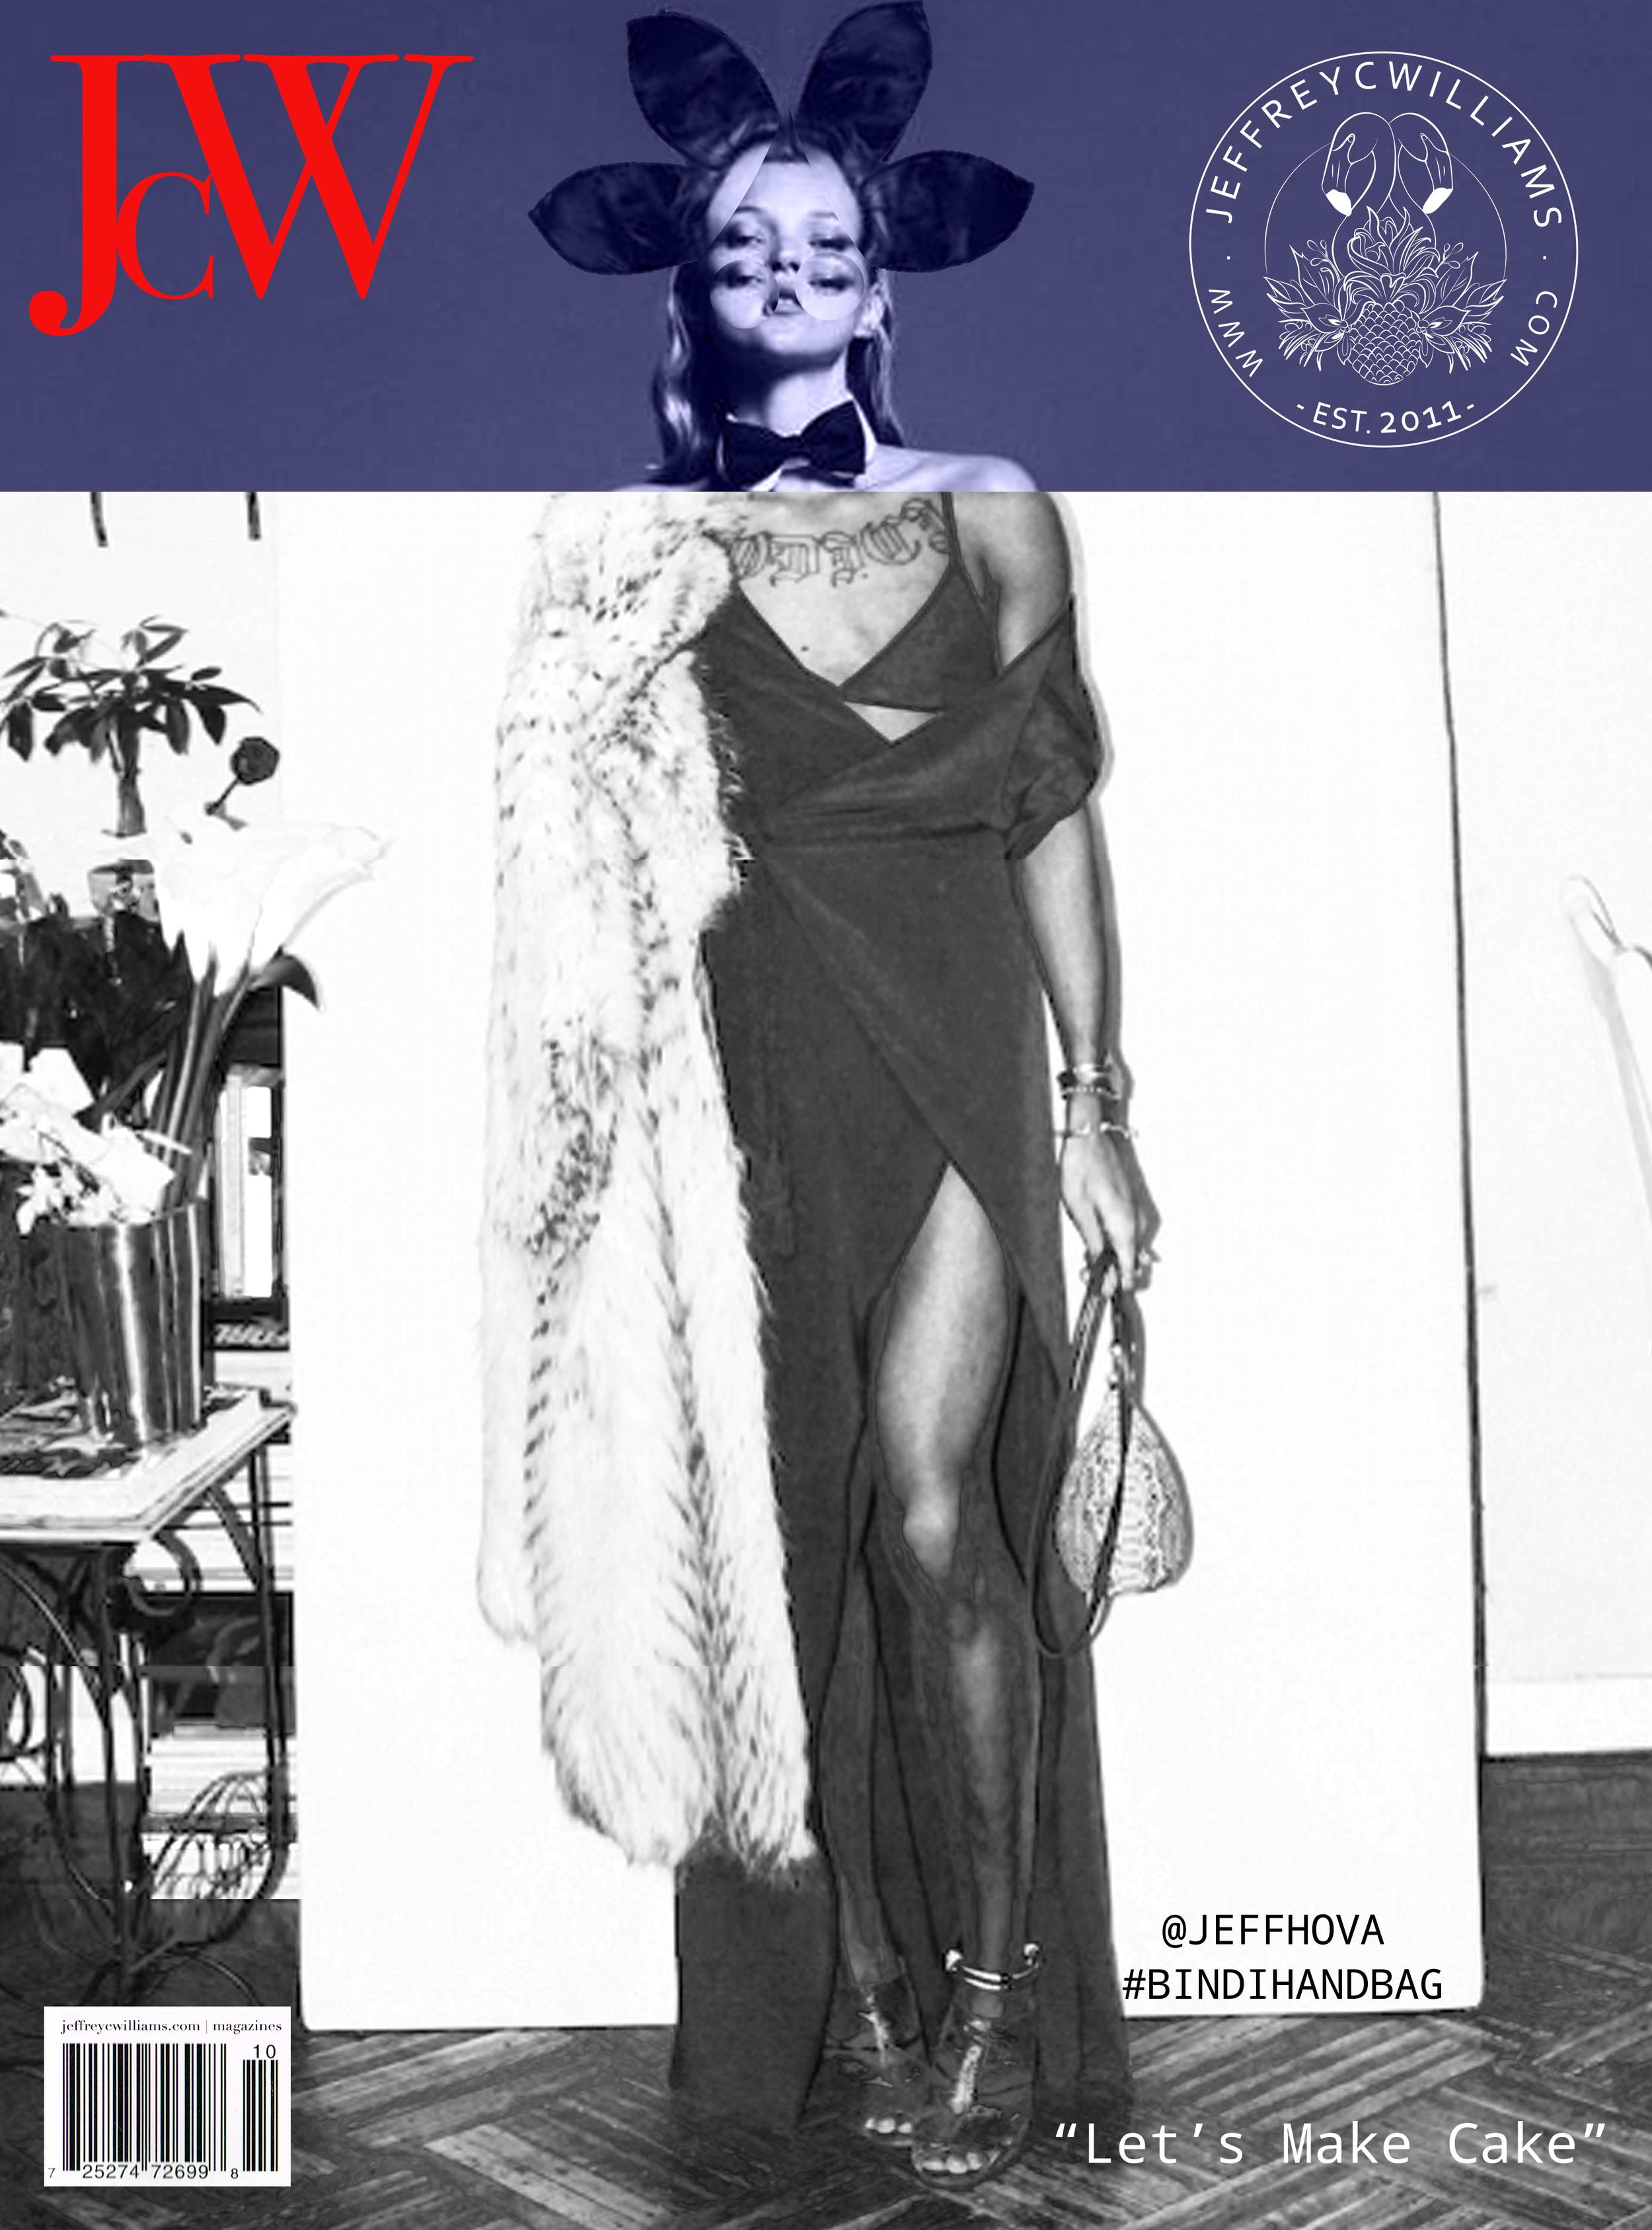 Jeffrey-Williams-Kate-Moss-magazine-Bindi-handbag.jpg